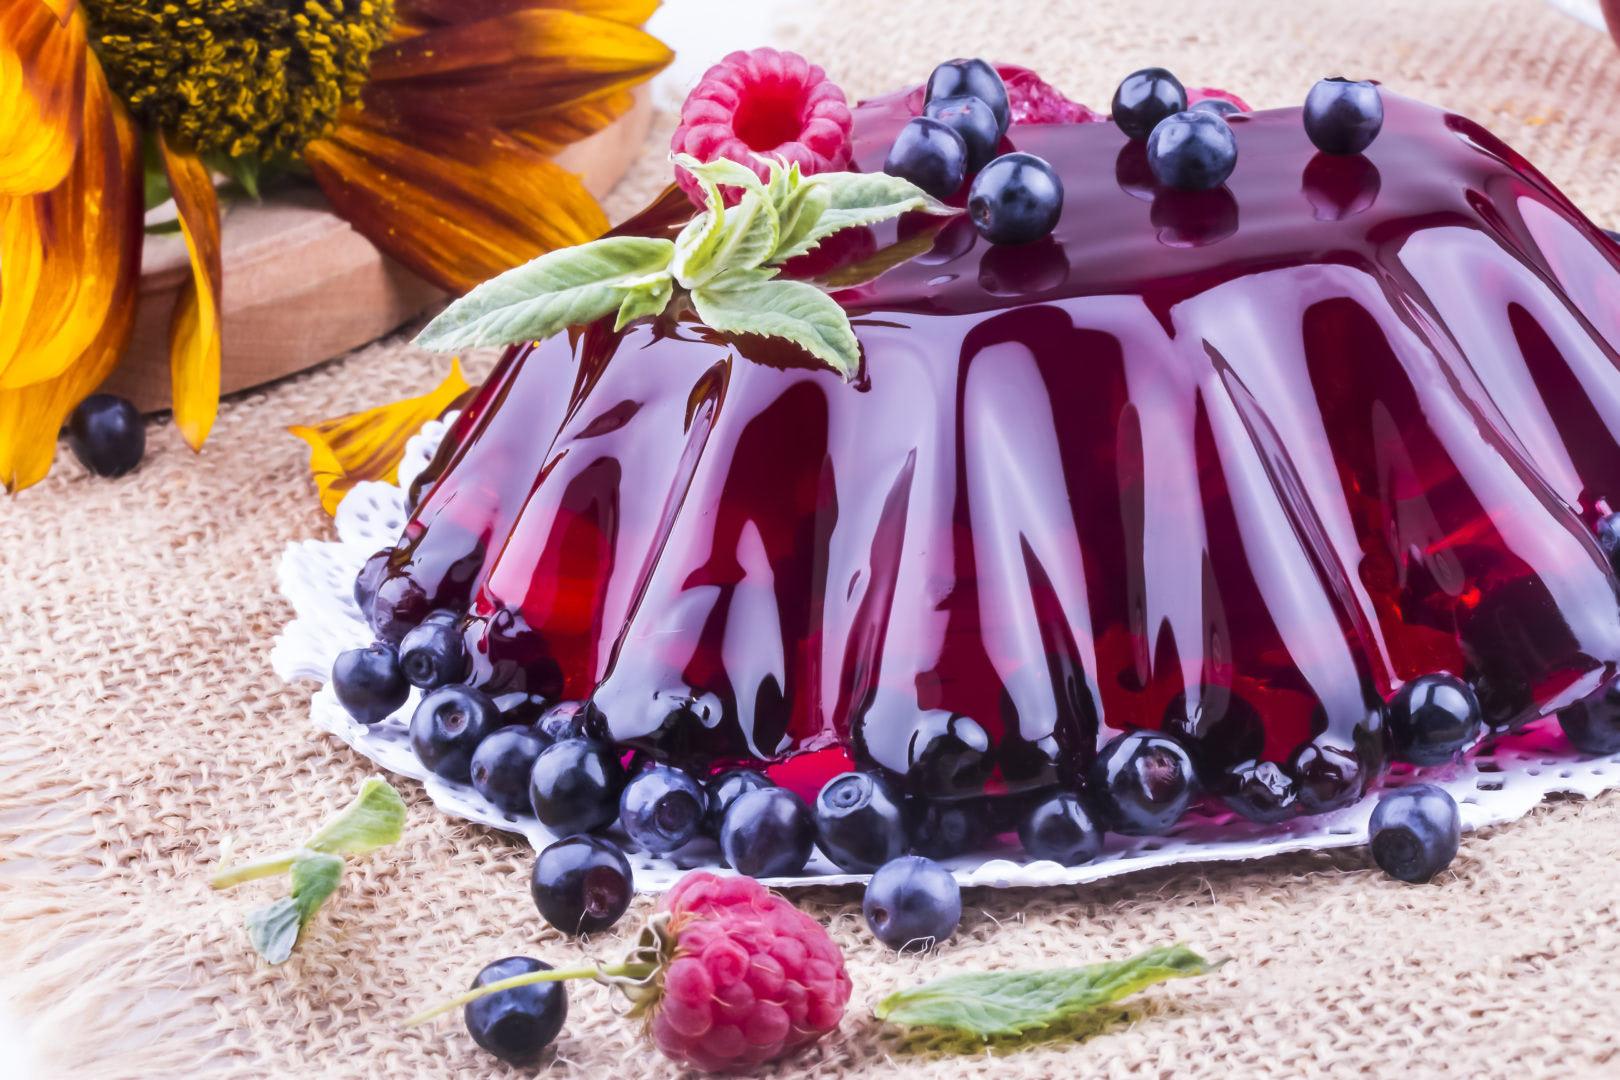 Jelly spécialité culinaire en Angleterre